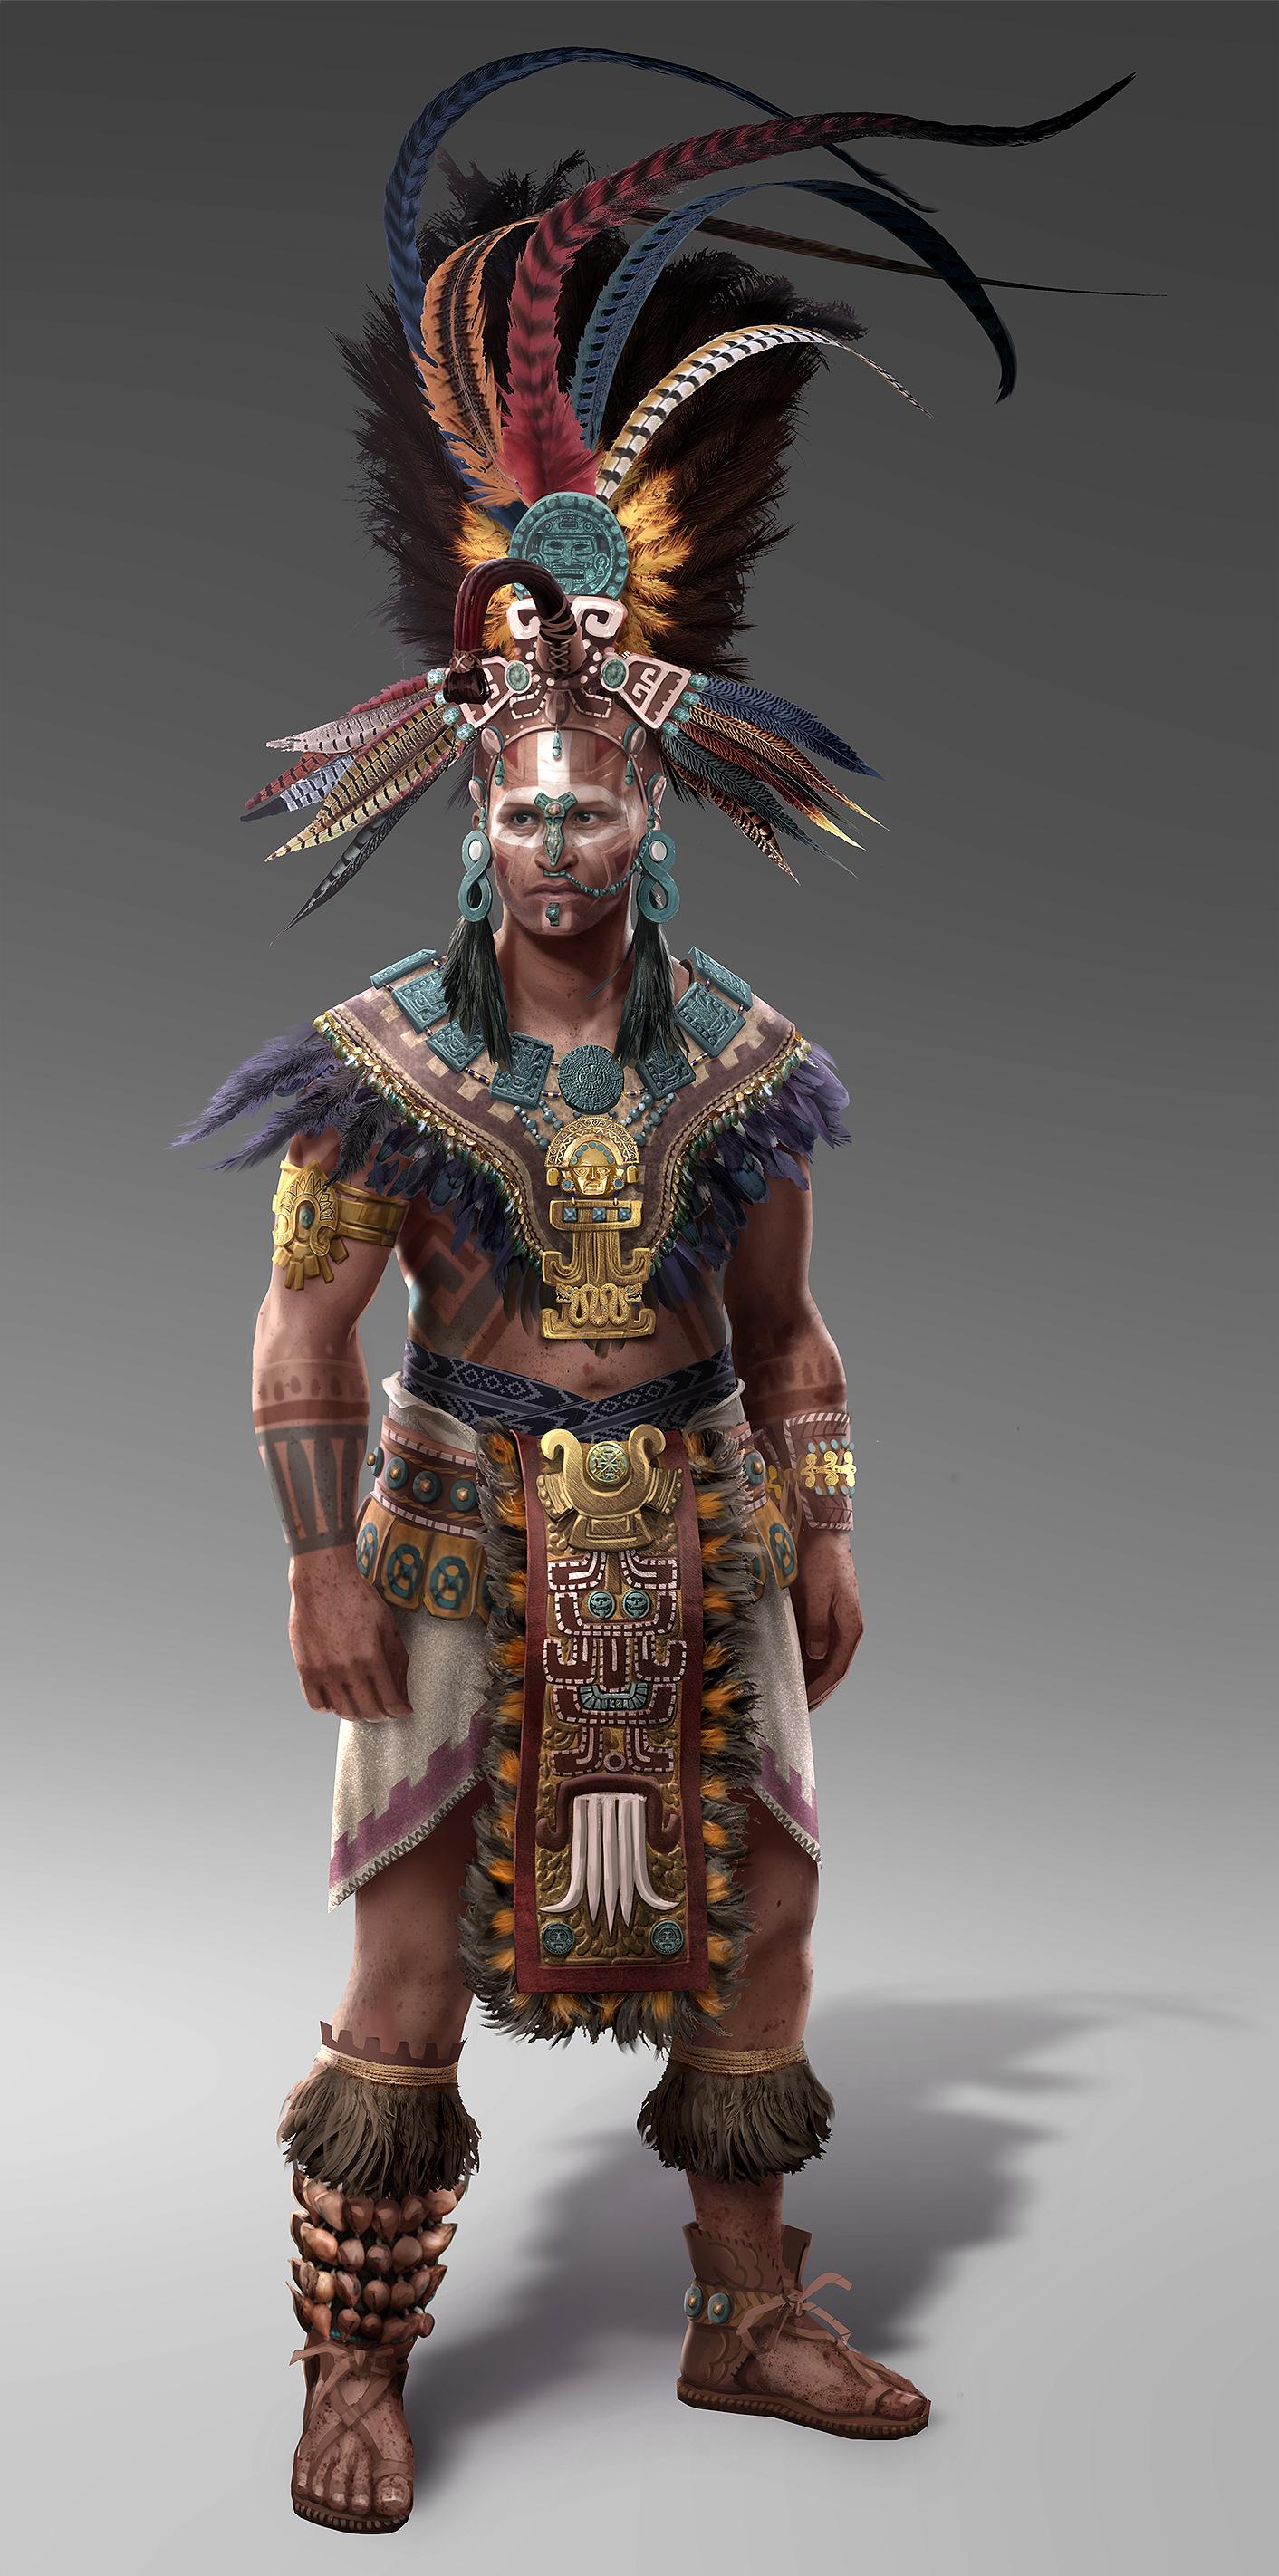 Eidos_TombRaider_AztecMale